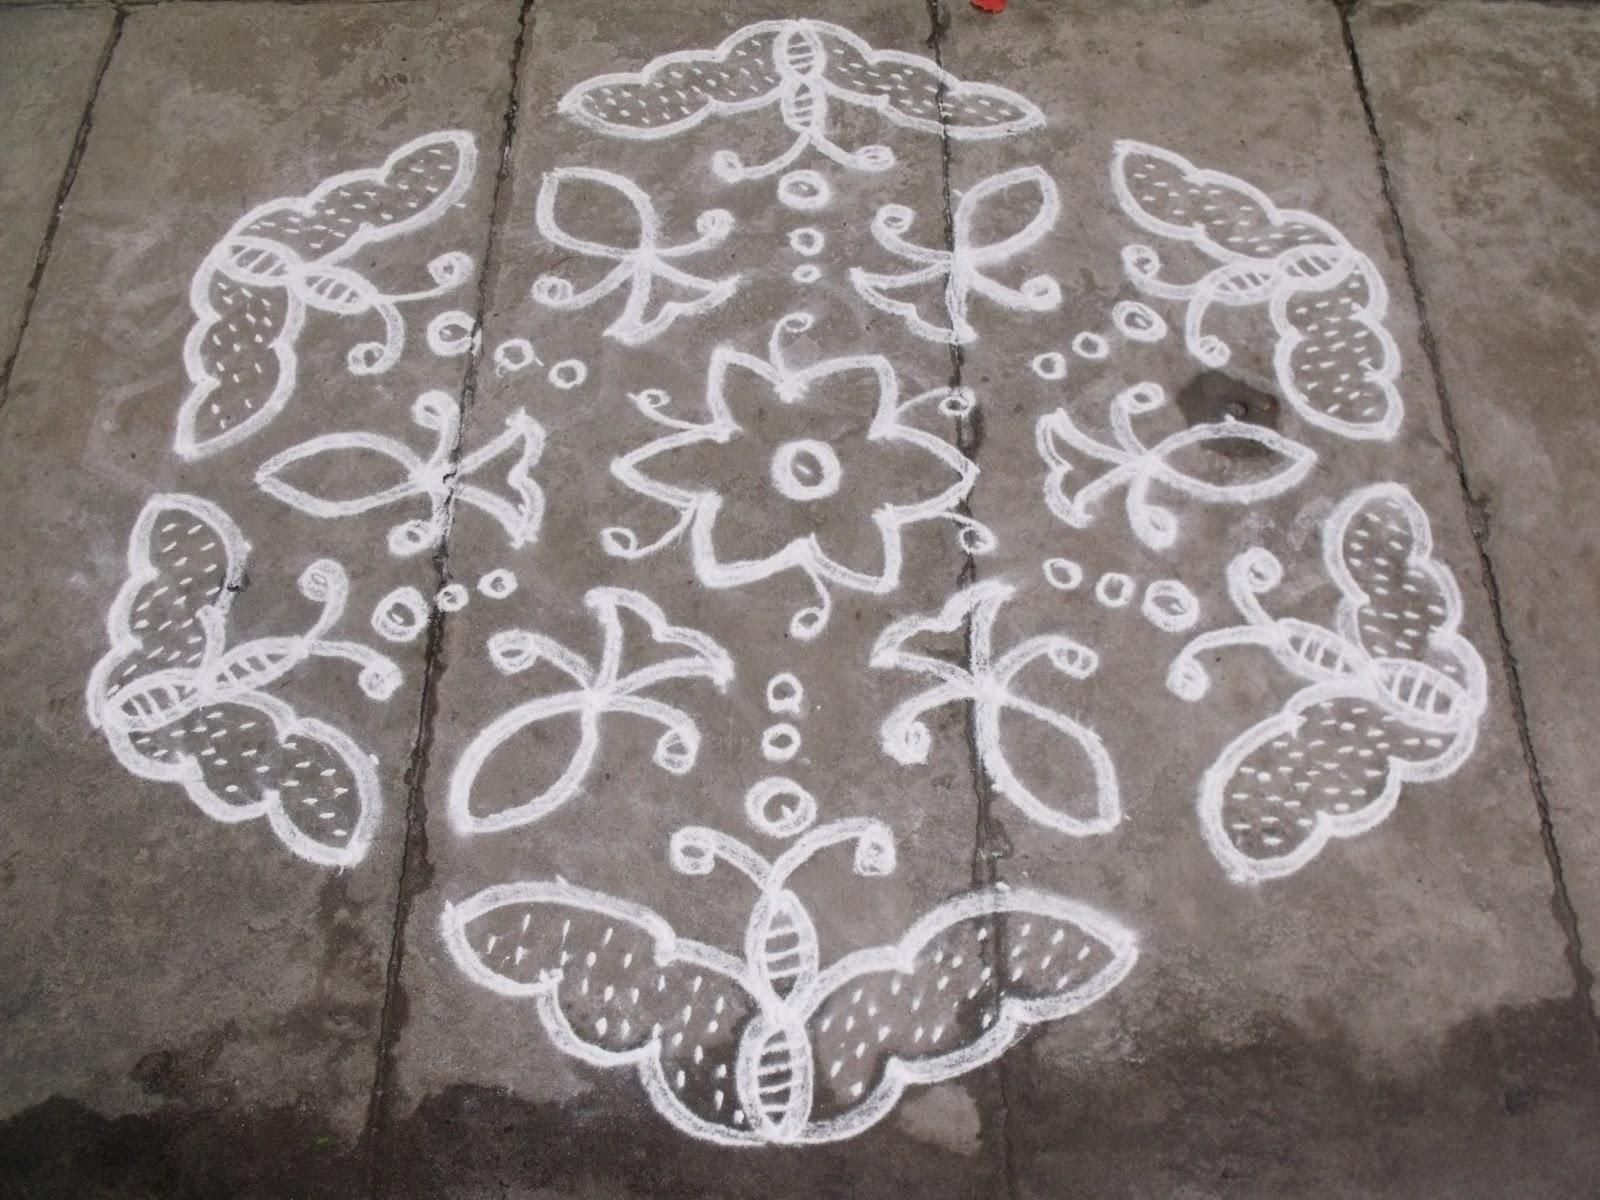 Rangoli designs/Kolam: 15-8 pulli kolam - interlaced dots kolam